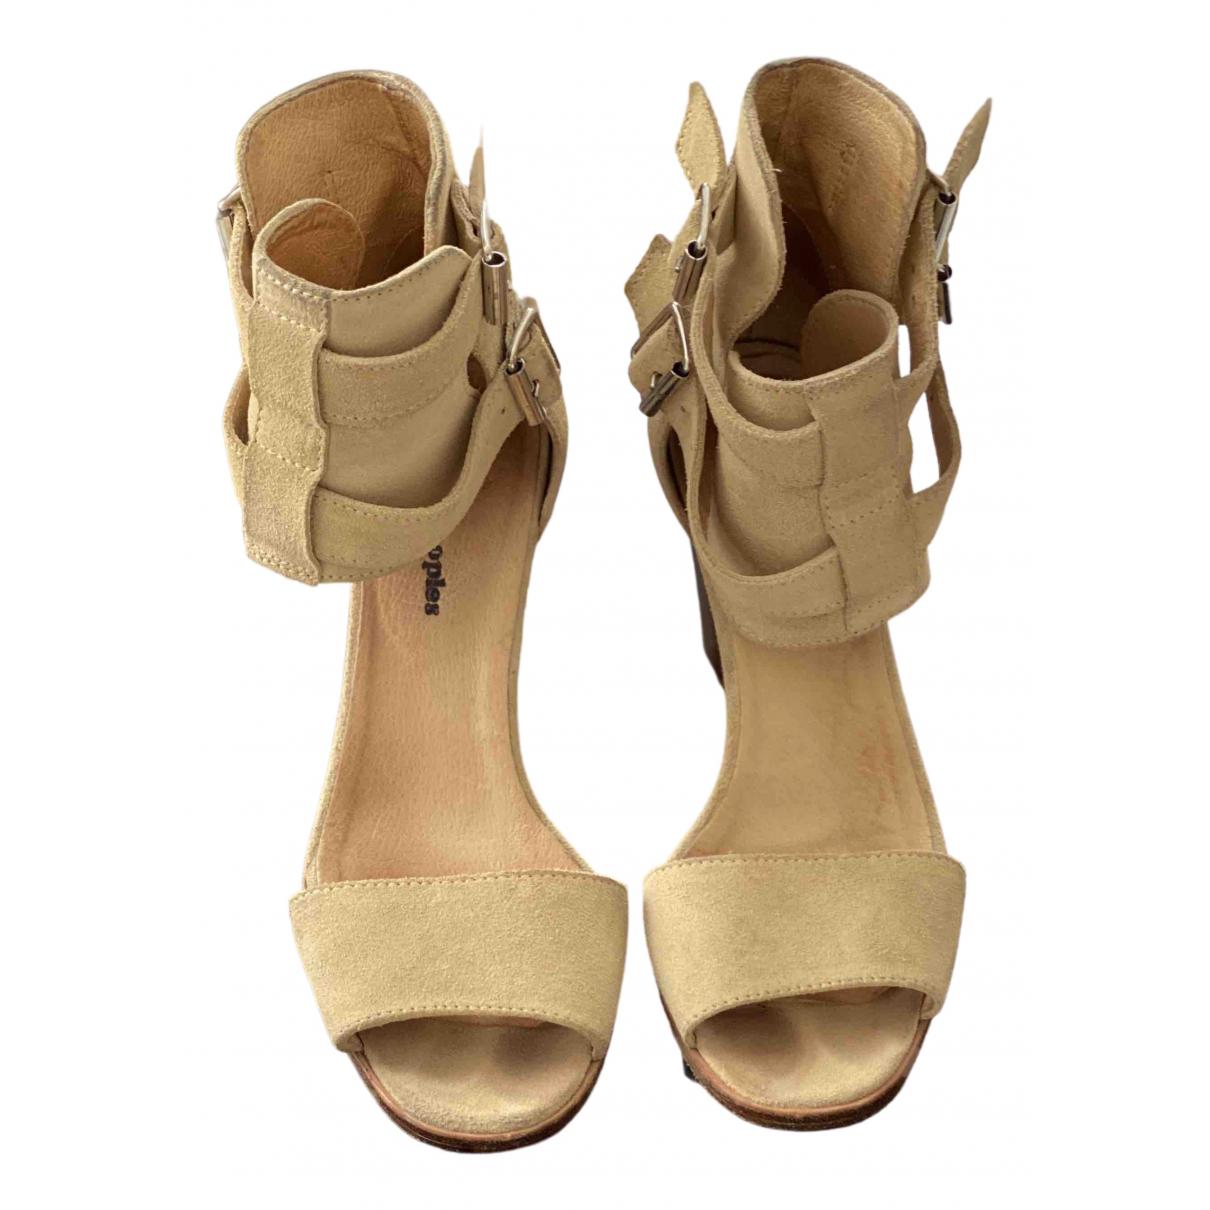 The Kooples \N Beige Leather Sandals for Women 37 EU